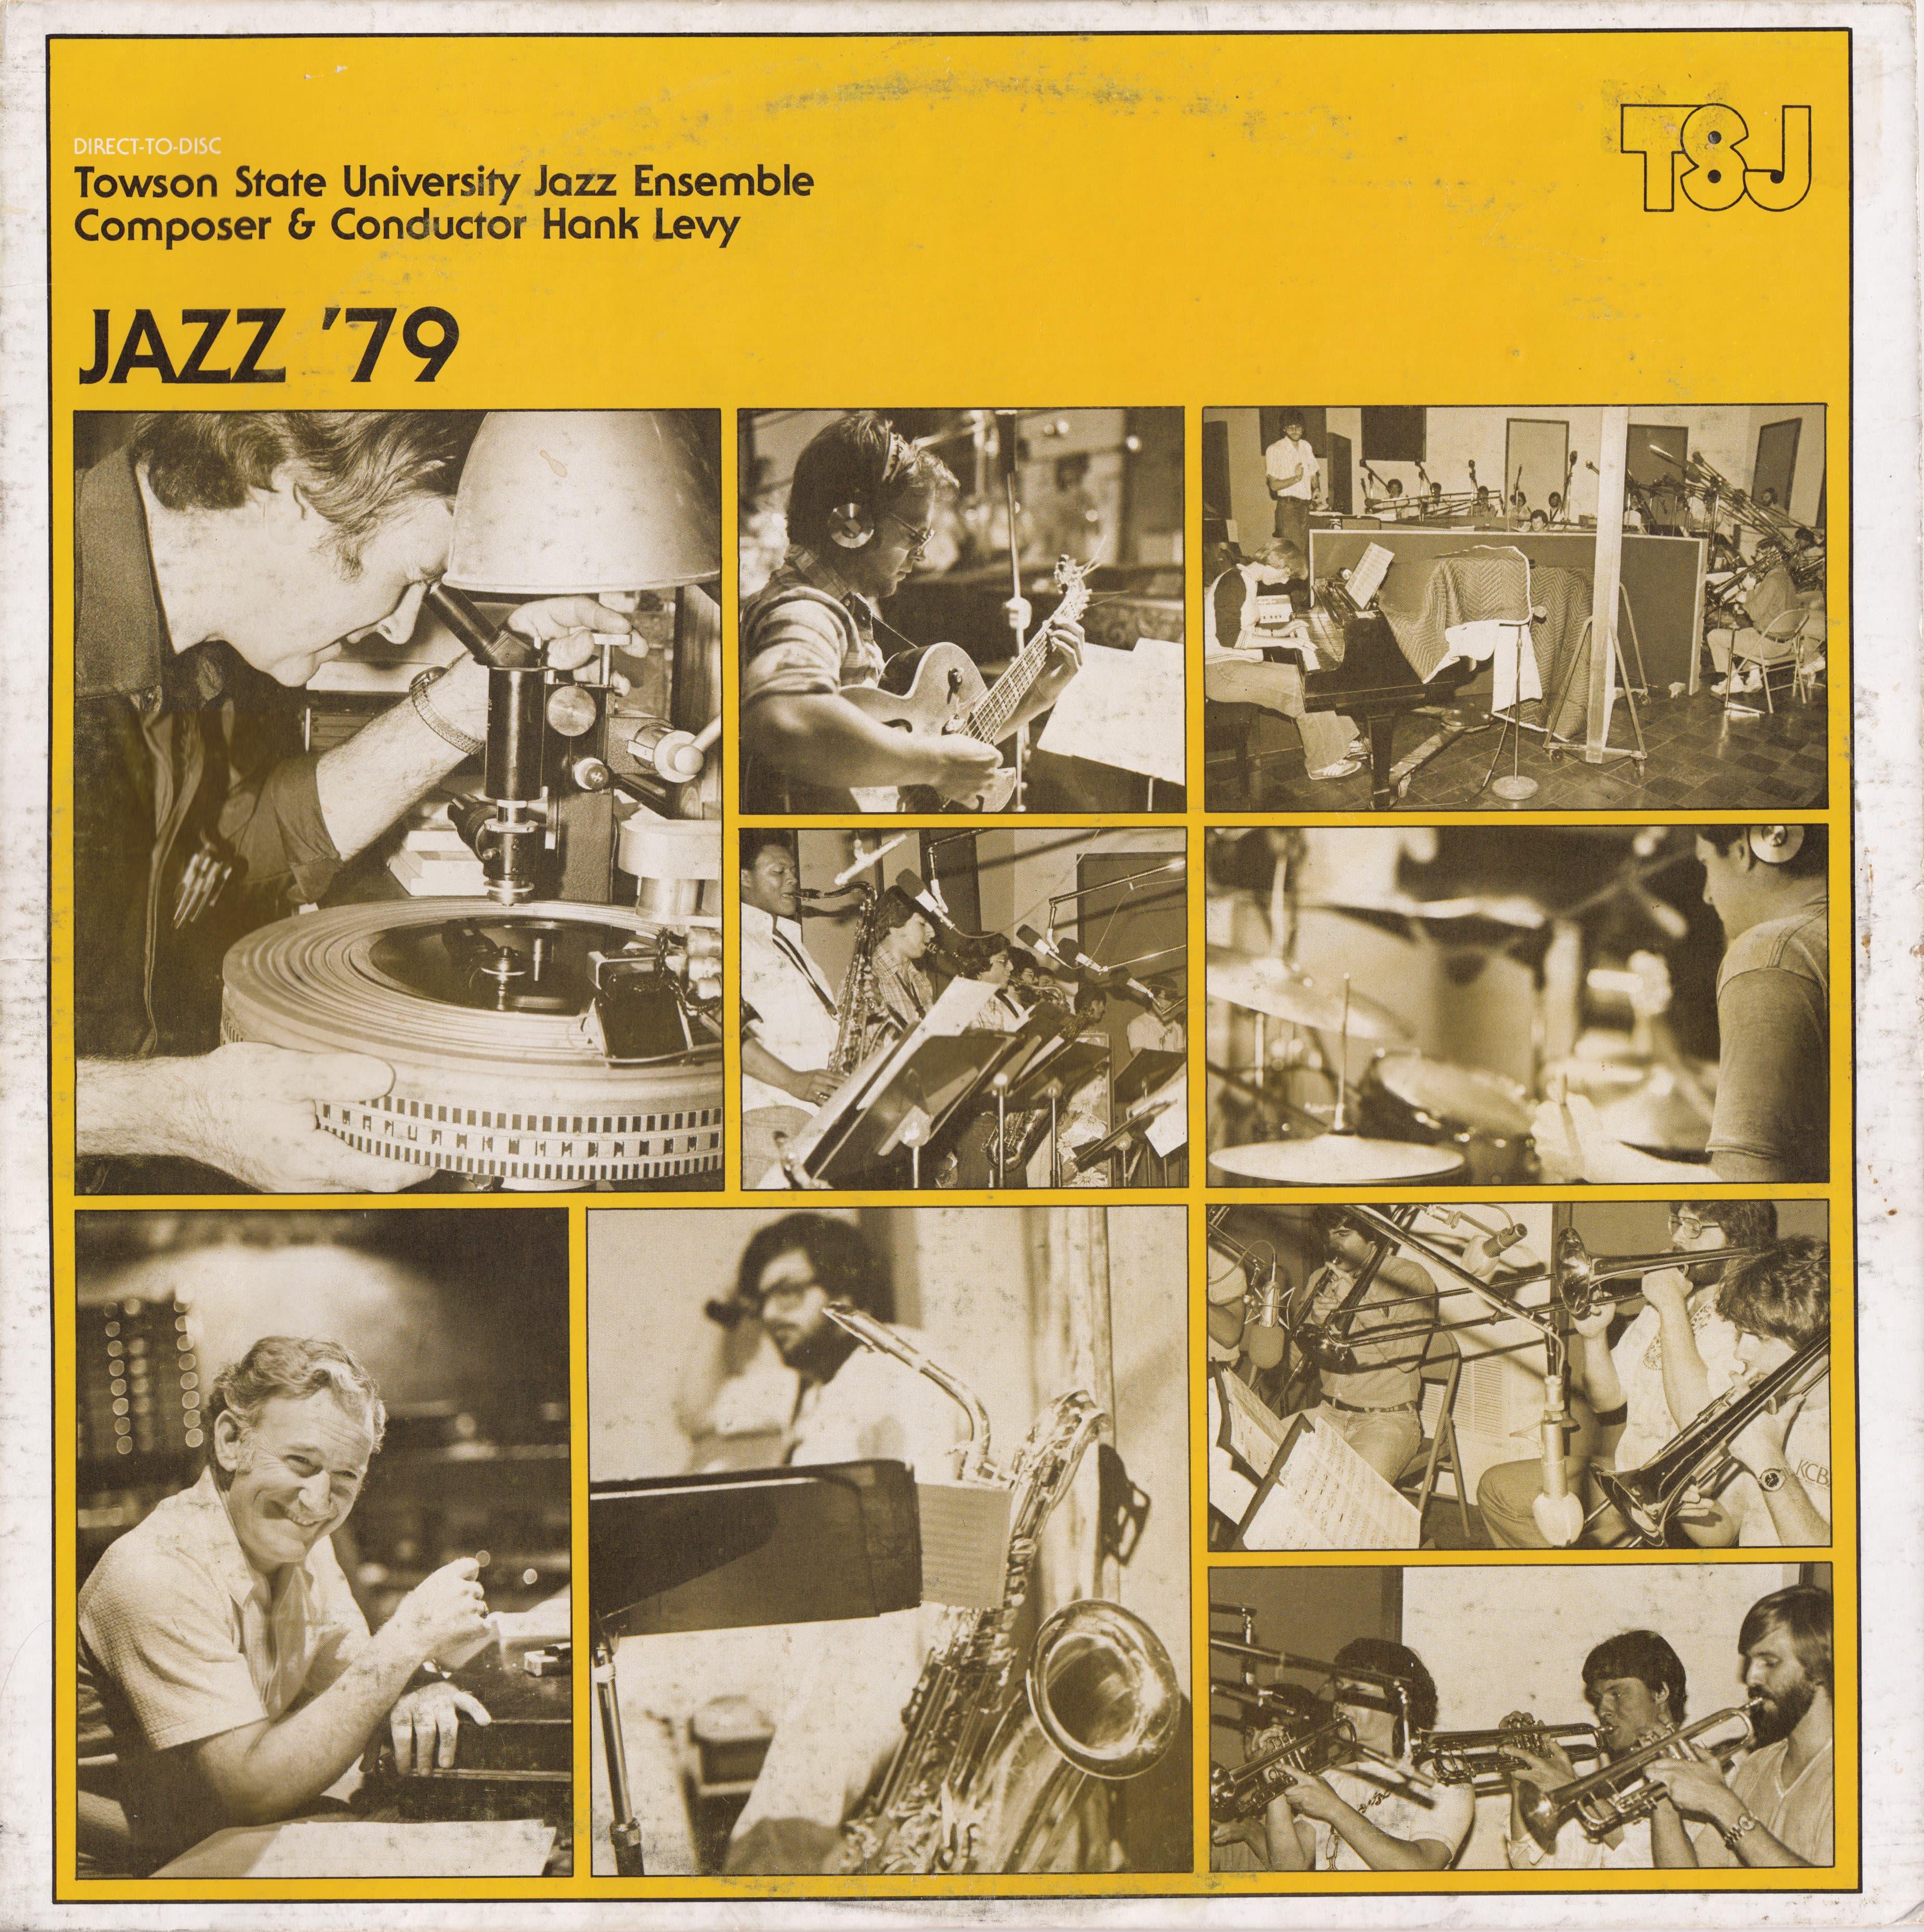 Towson State University Jazz Ensemble - Jazz '79